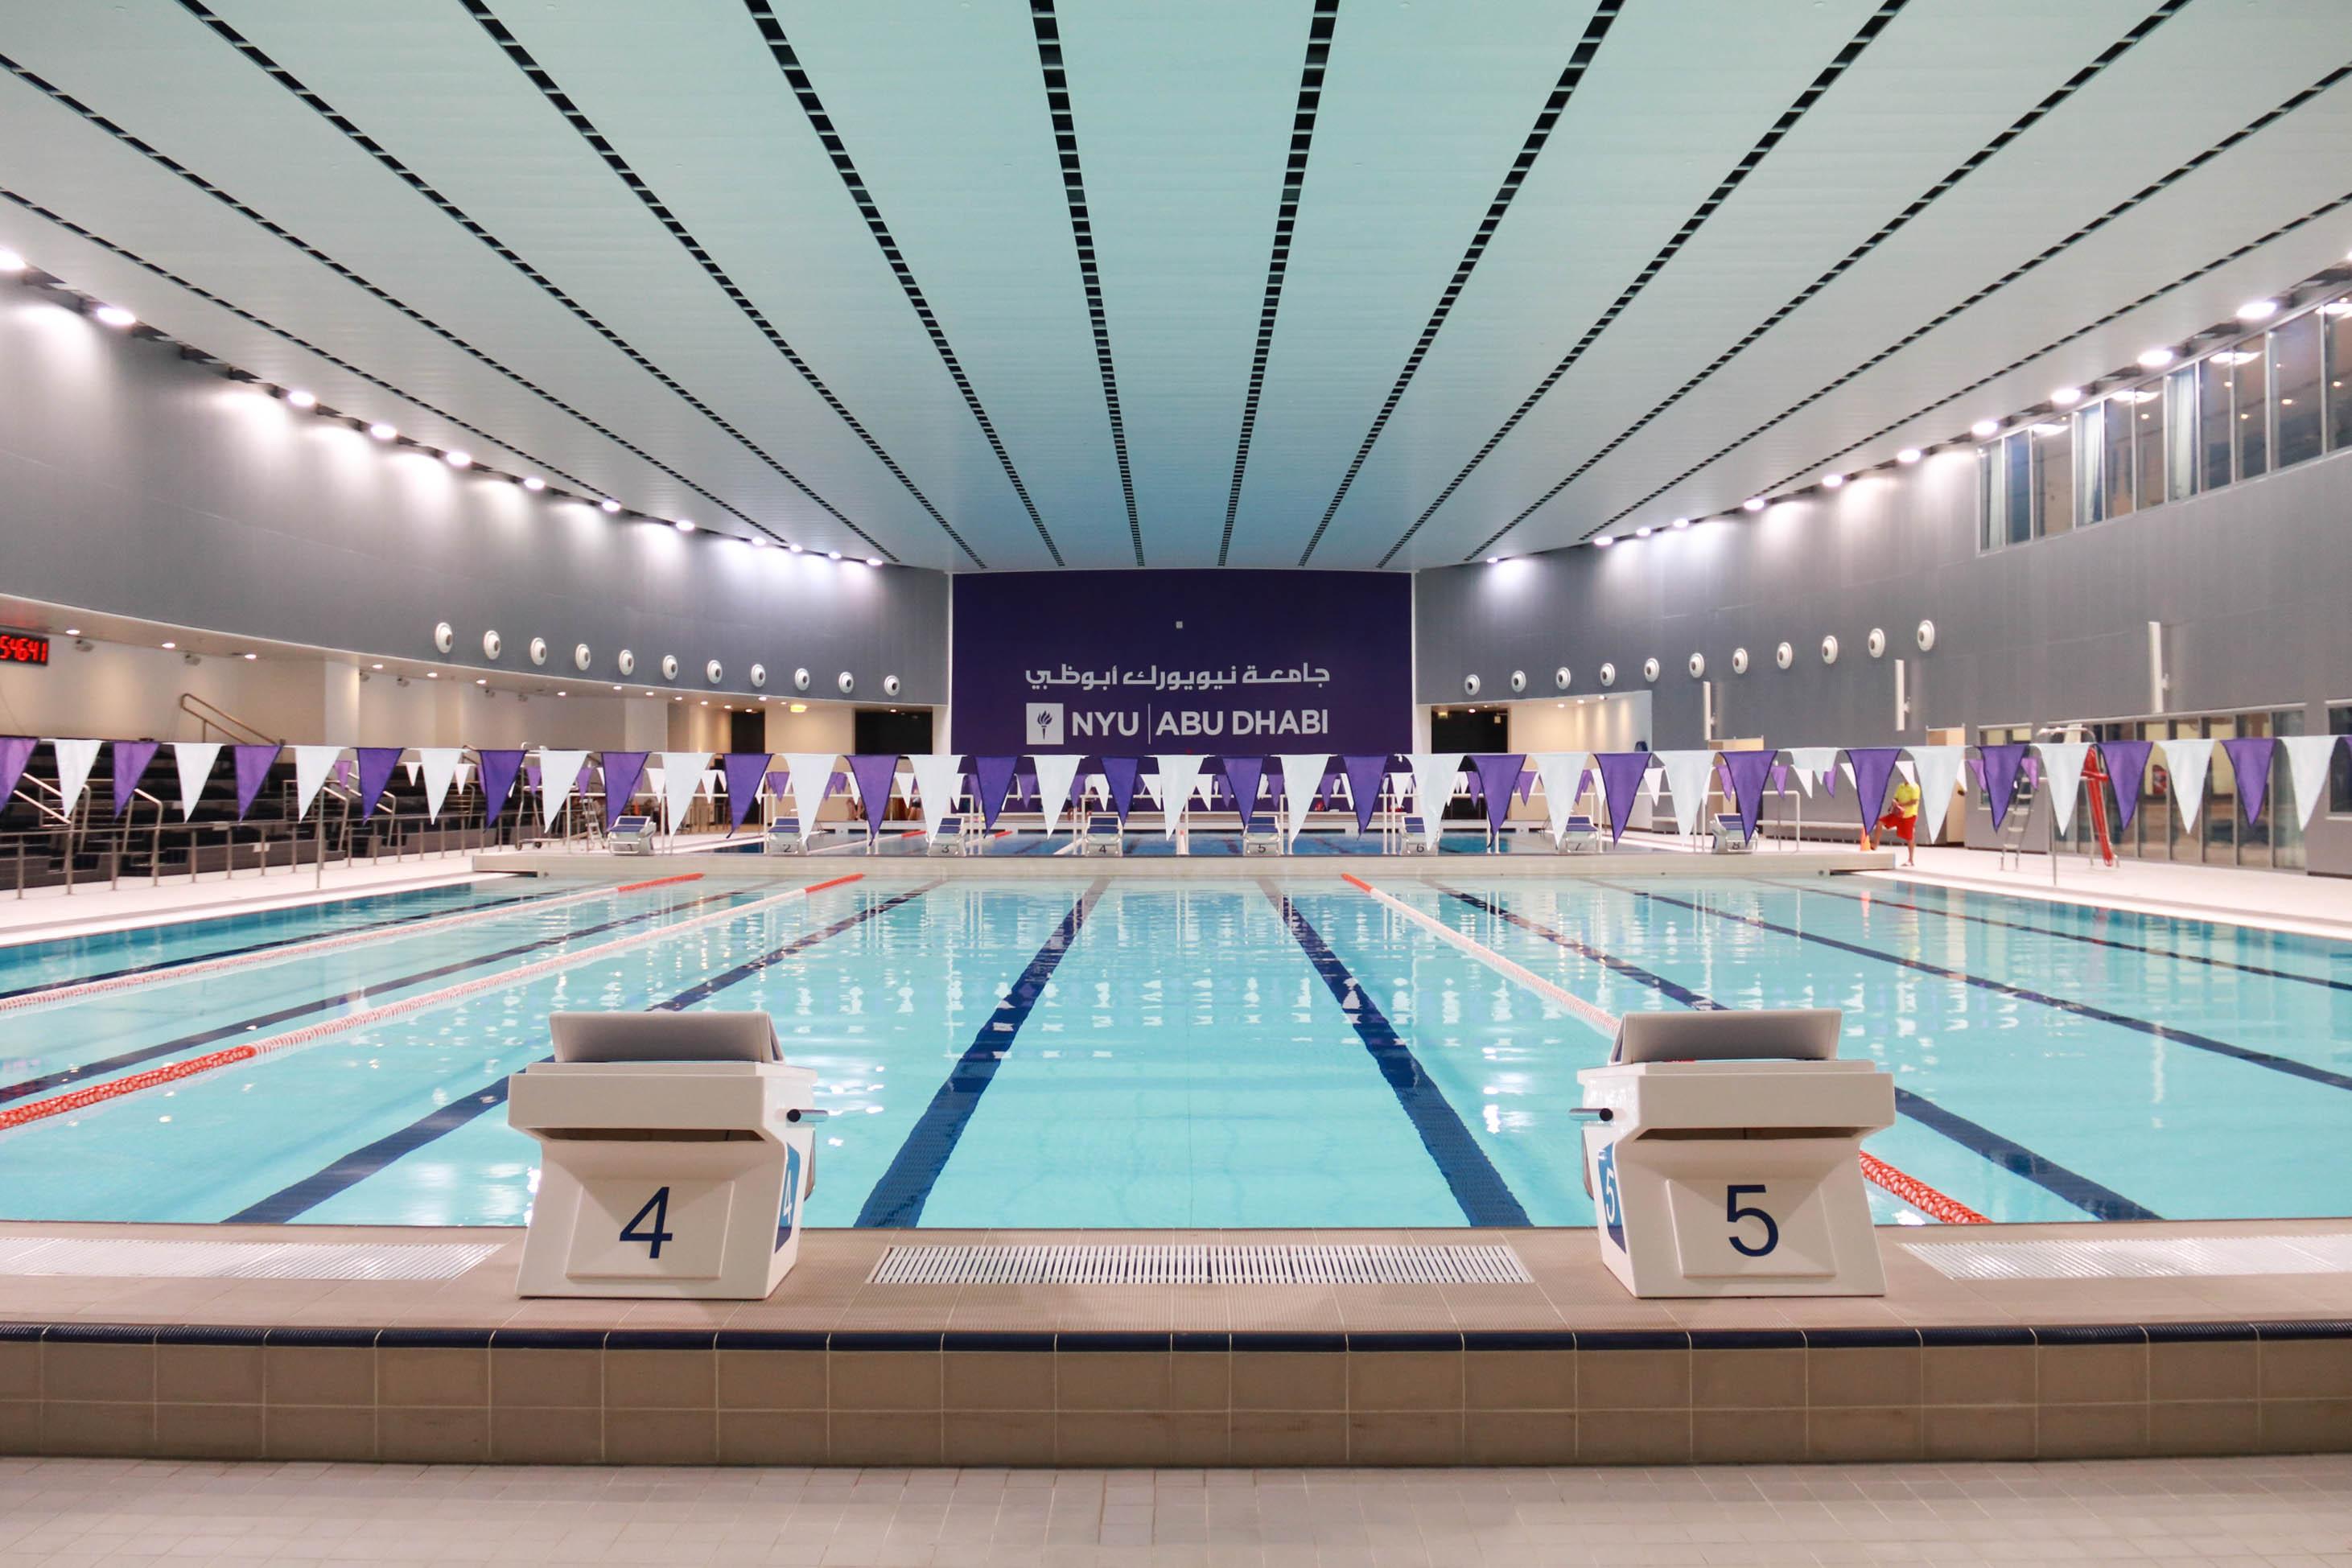 NYUAD Swimming pool